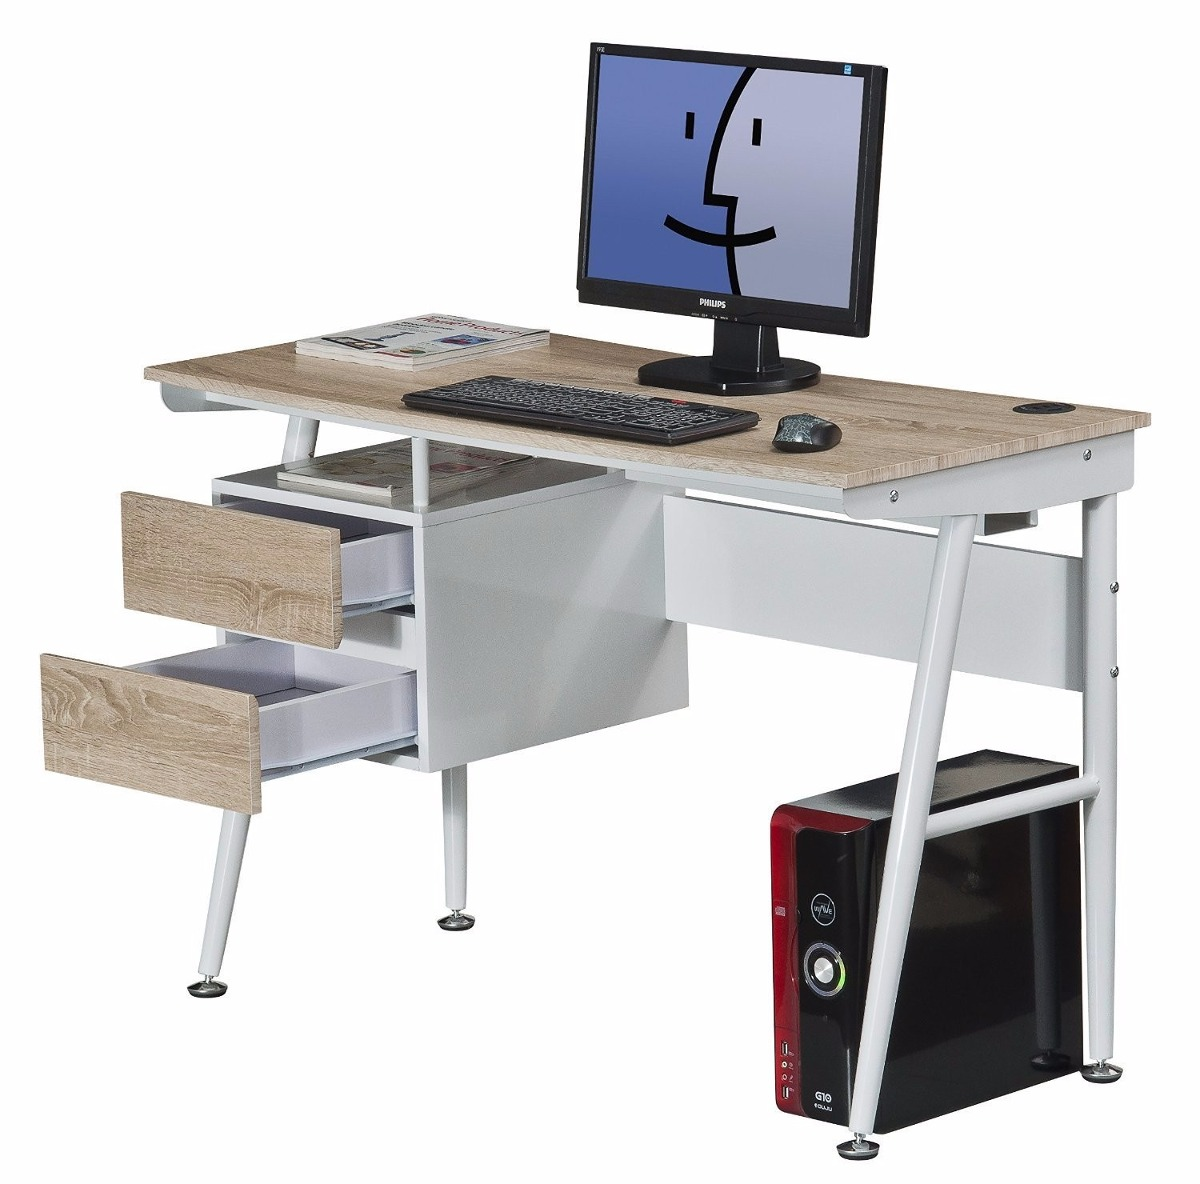 Escritorio clasico oficina computadora mueble madera acero - Modelos de escritorios de madera ...